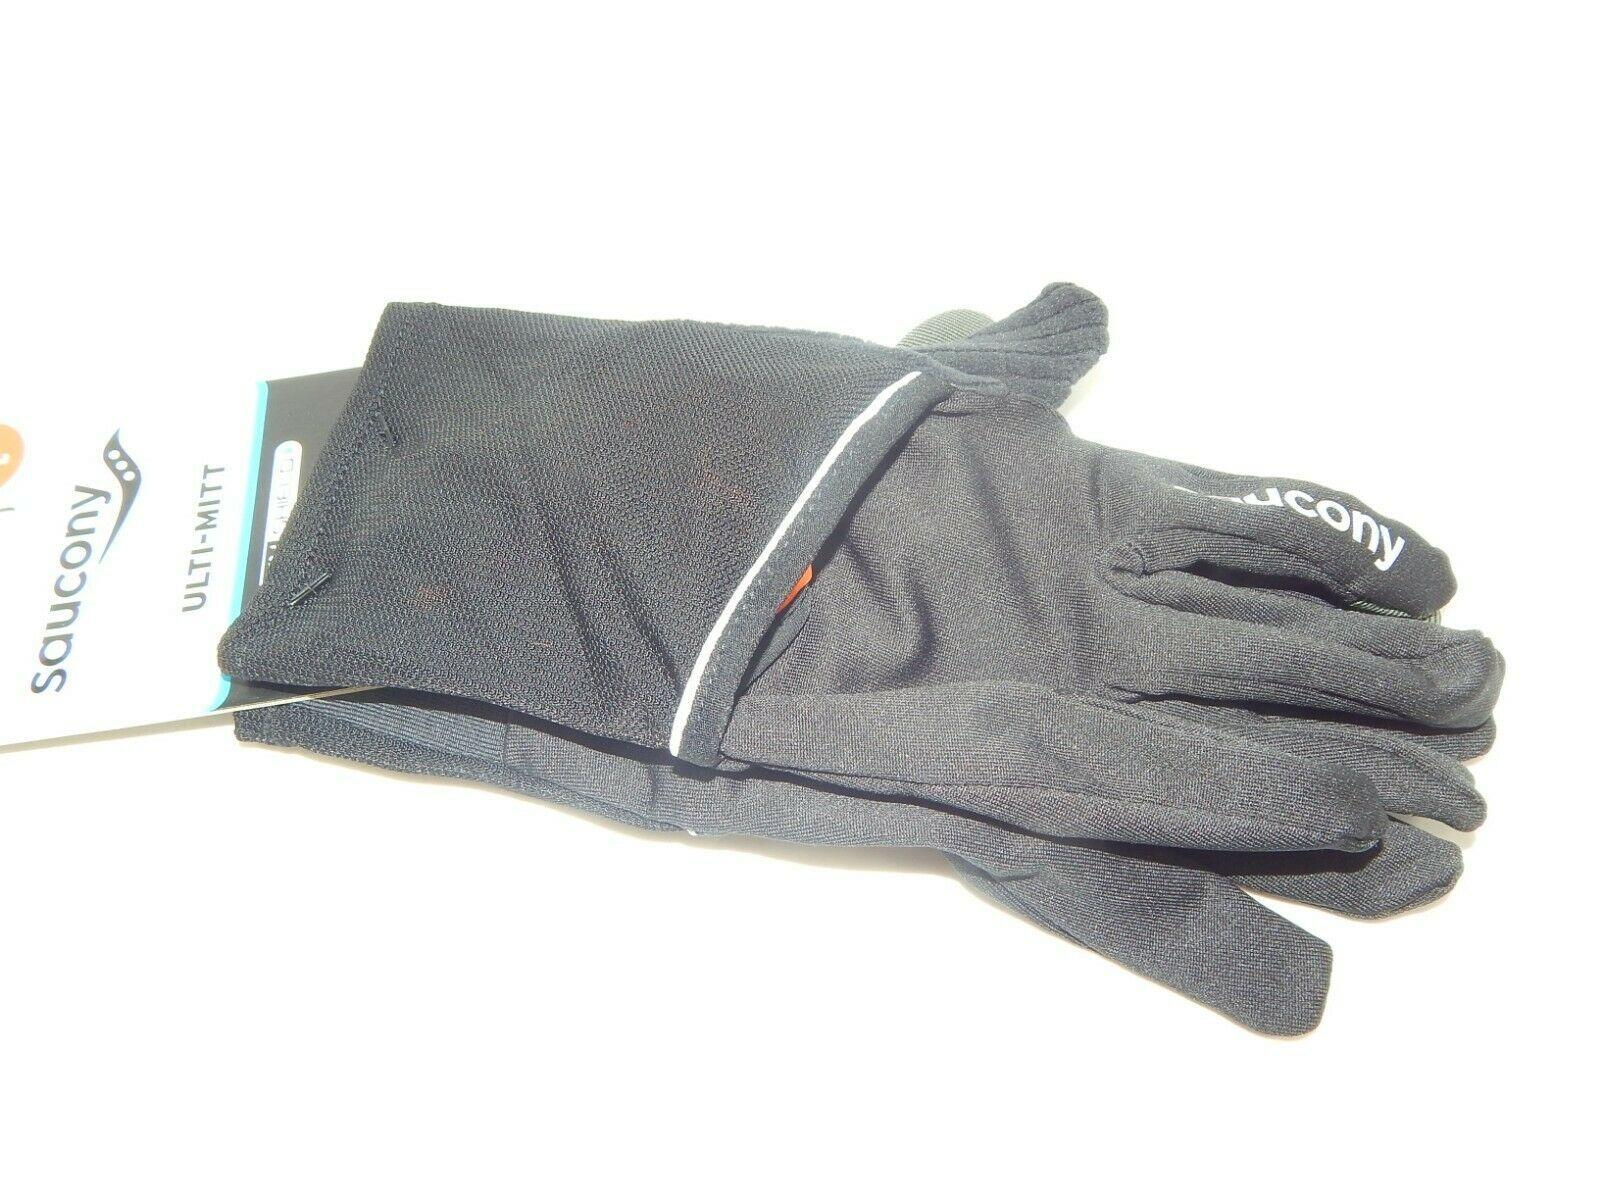 Saucony Ulti-Mitt Size L Large Convertible Pocket Thermal Running Gloves Orange